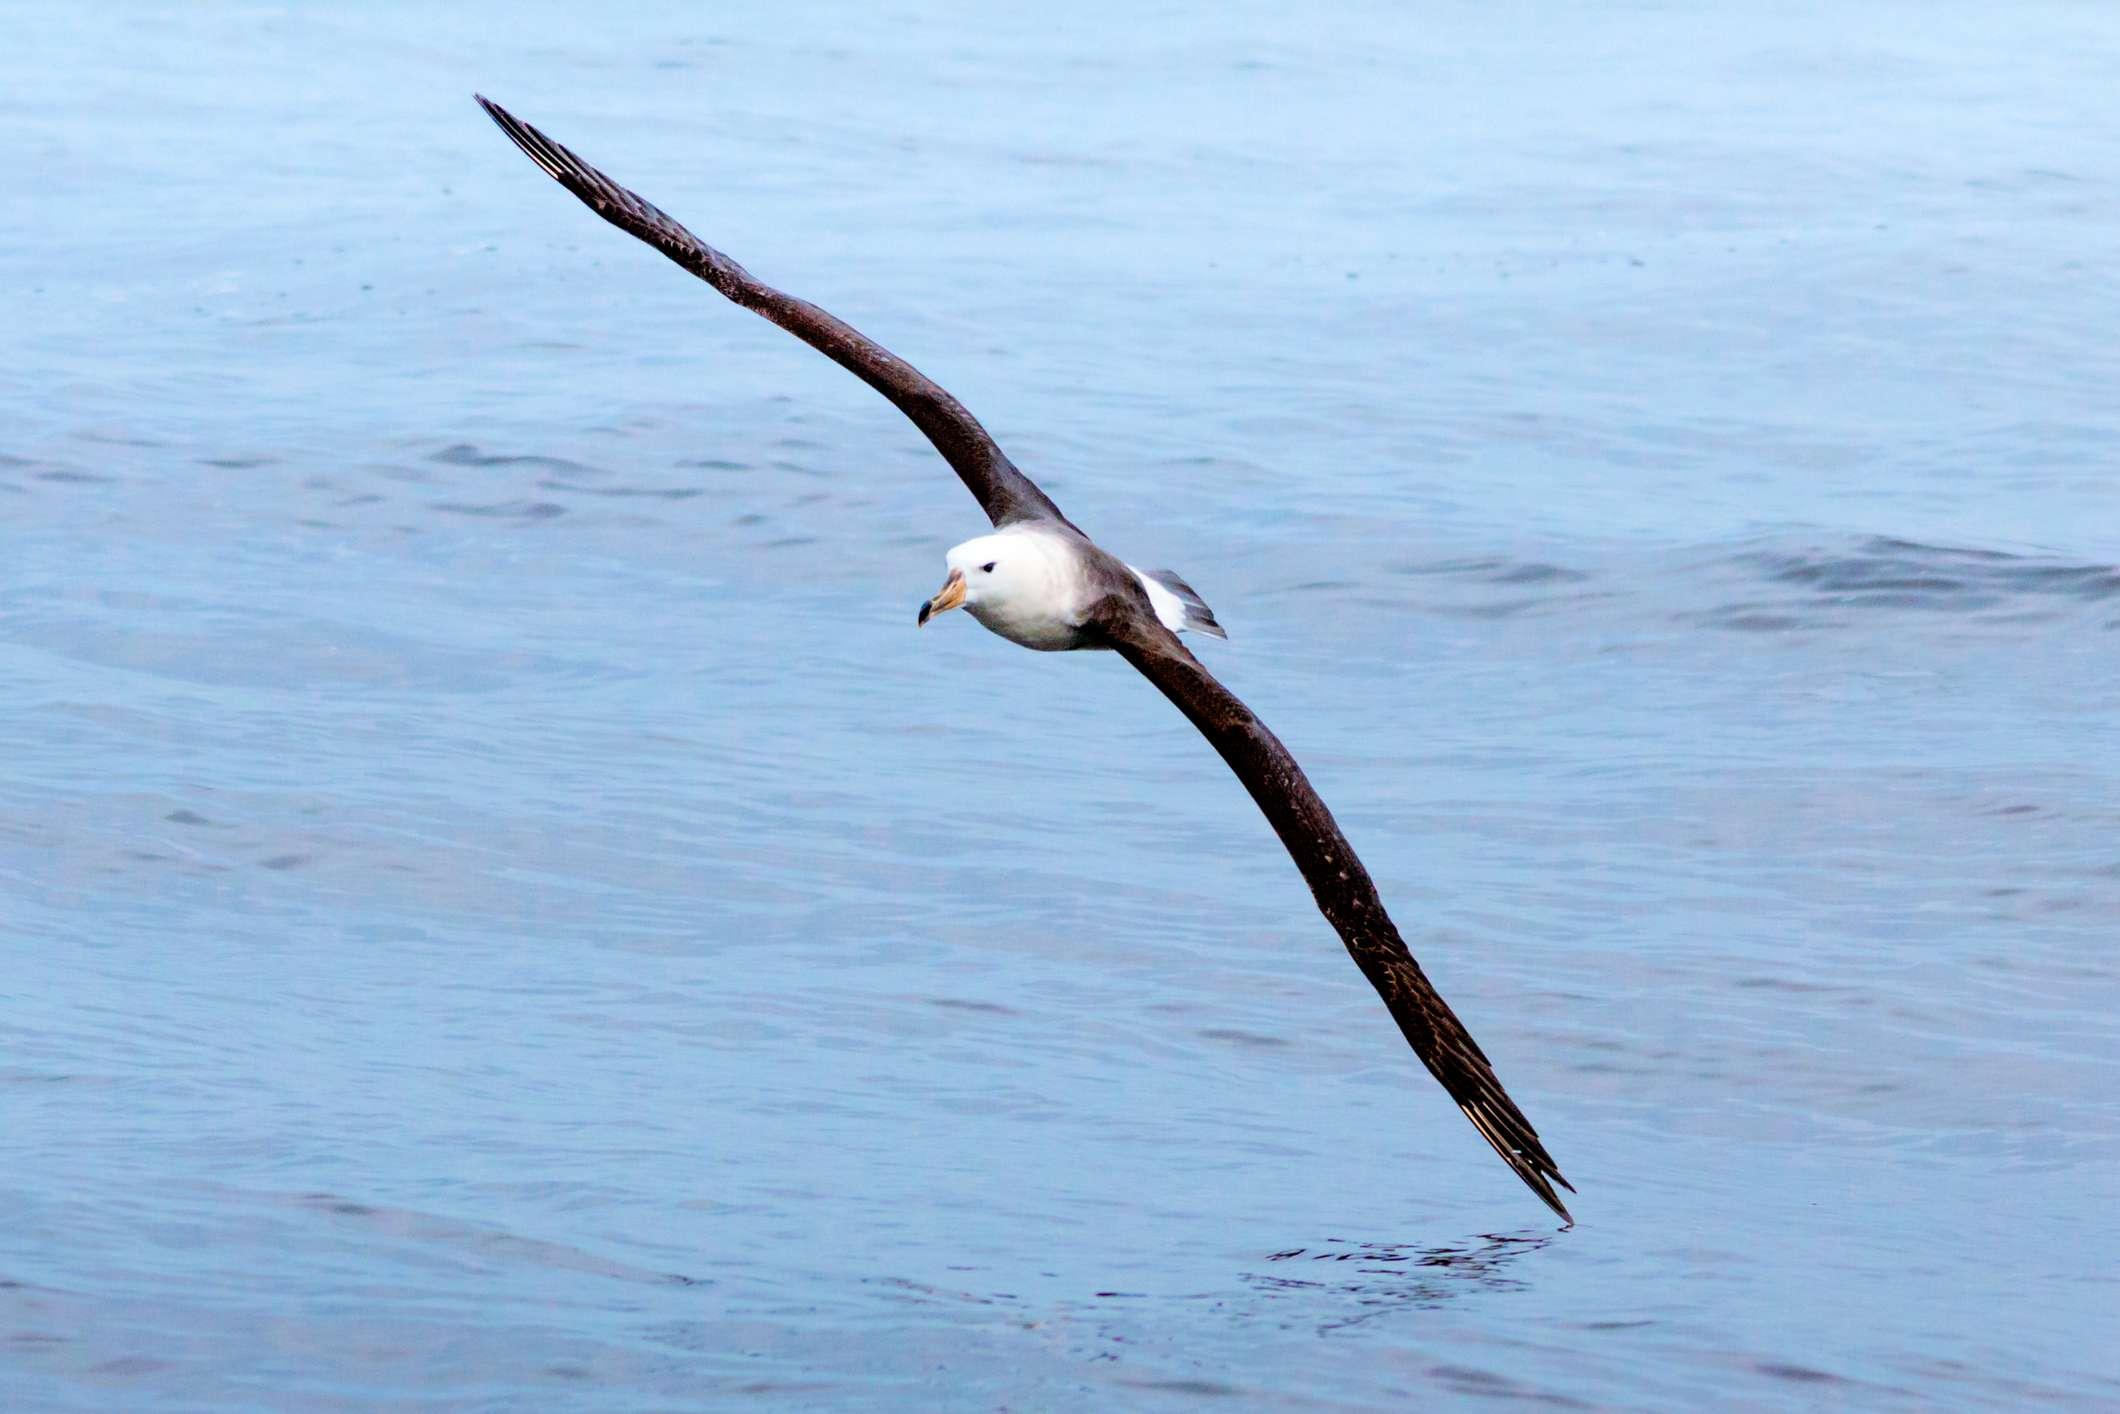 Albatross flying over the ocean